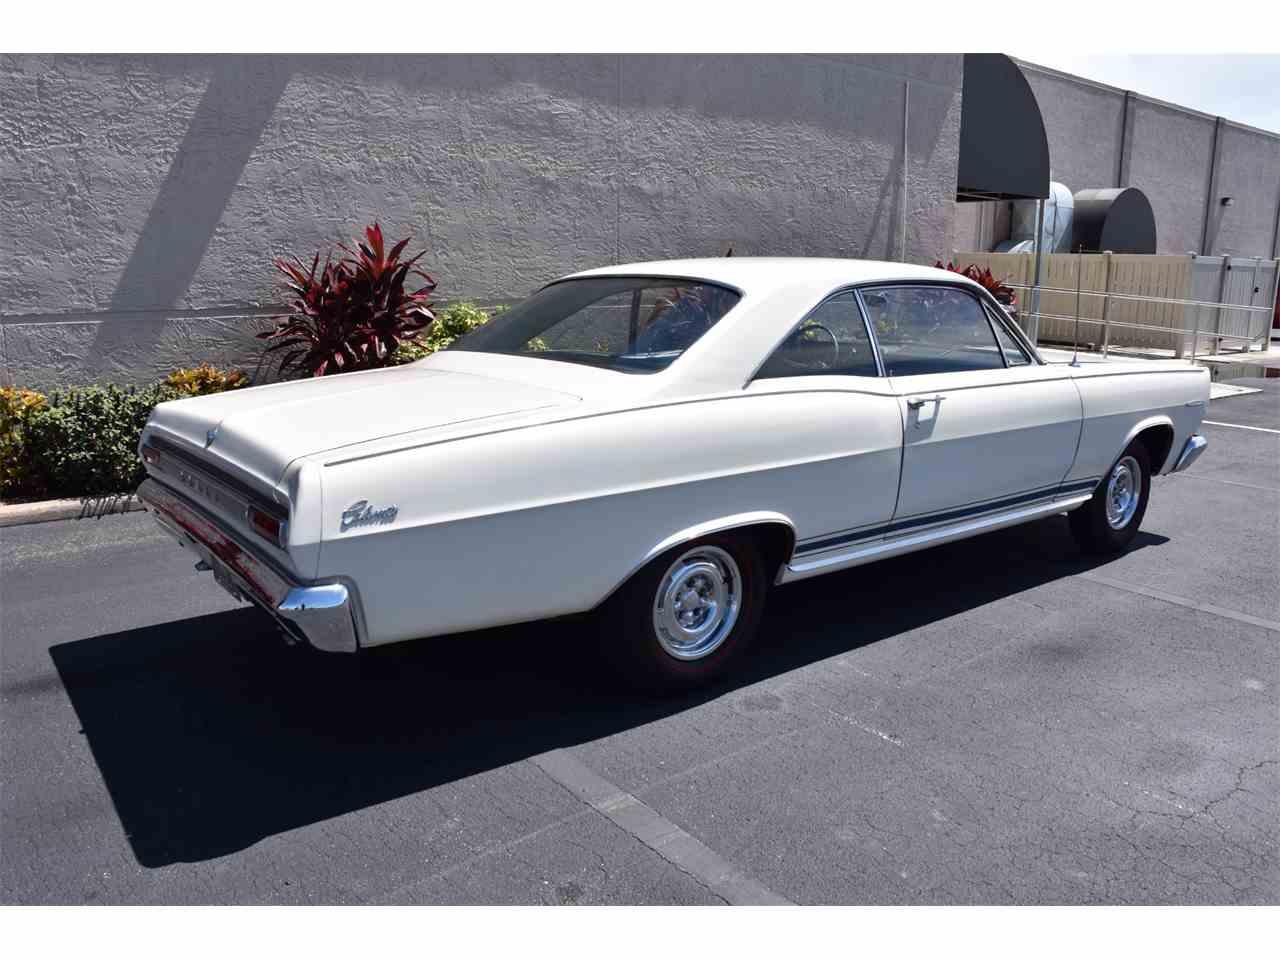 1966 Mercury Comet for Sale | ClassicCars.com | CC-1016992